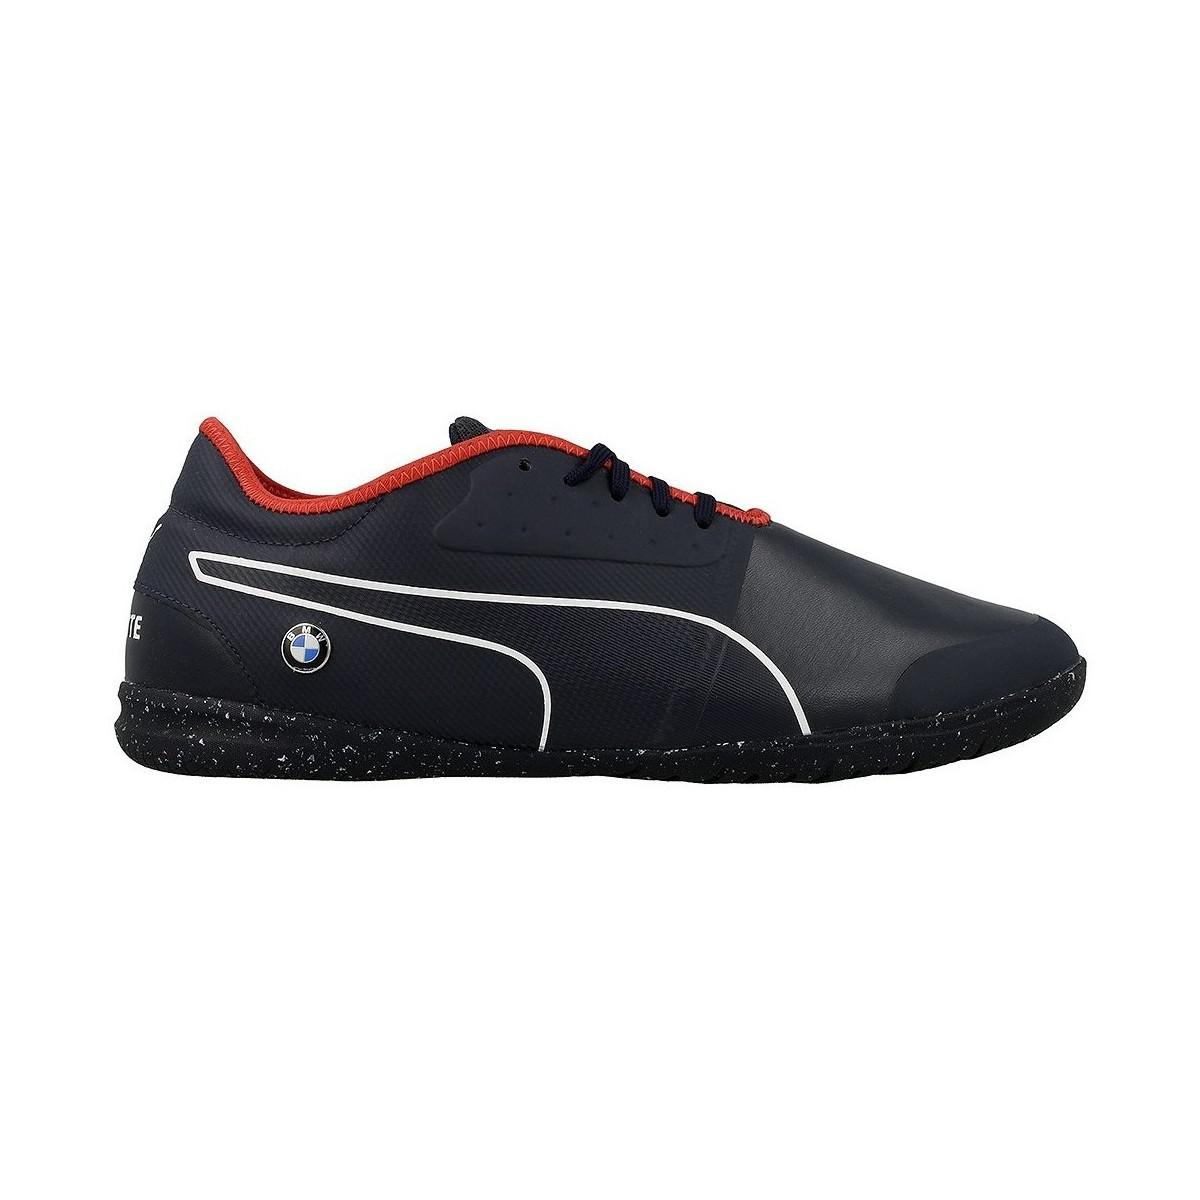 Changer Mu Chaussures weekend Bmw Team 2nugqmya Daily Puma B Ms nwPkX8O0